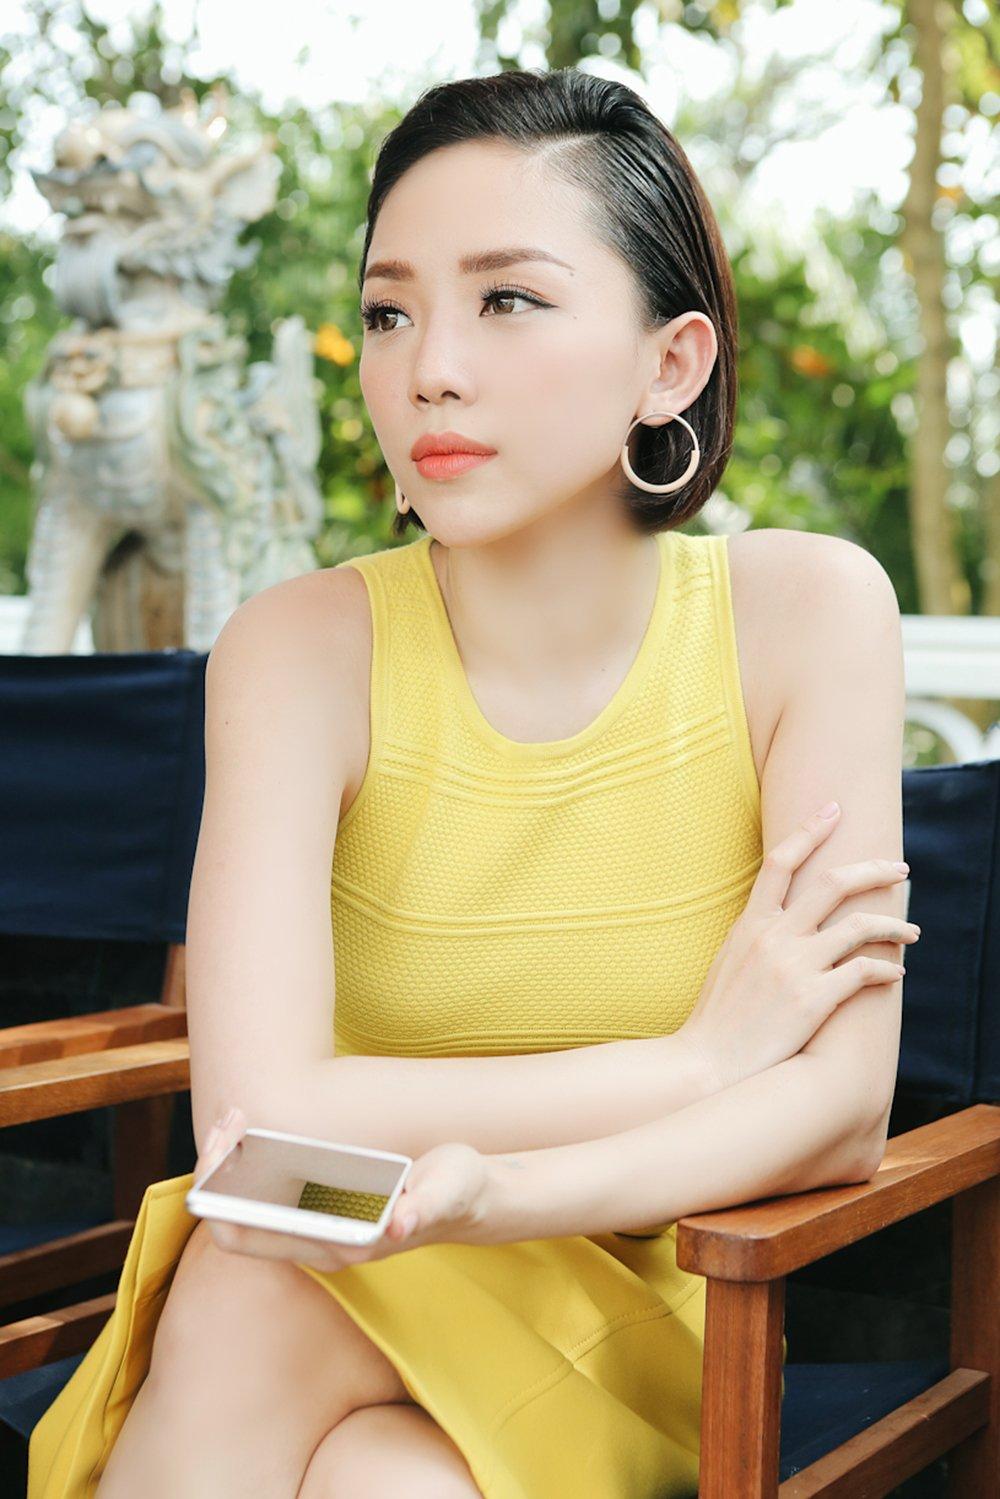 Toc Tien la huan luyen vien cung chieu hoc tro nhat tai 'The Voice 2017' hinh anh 1